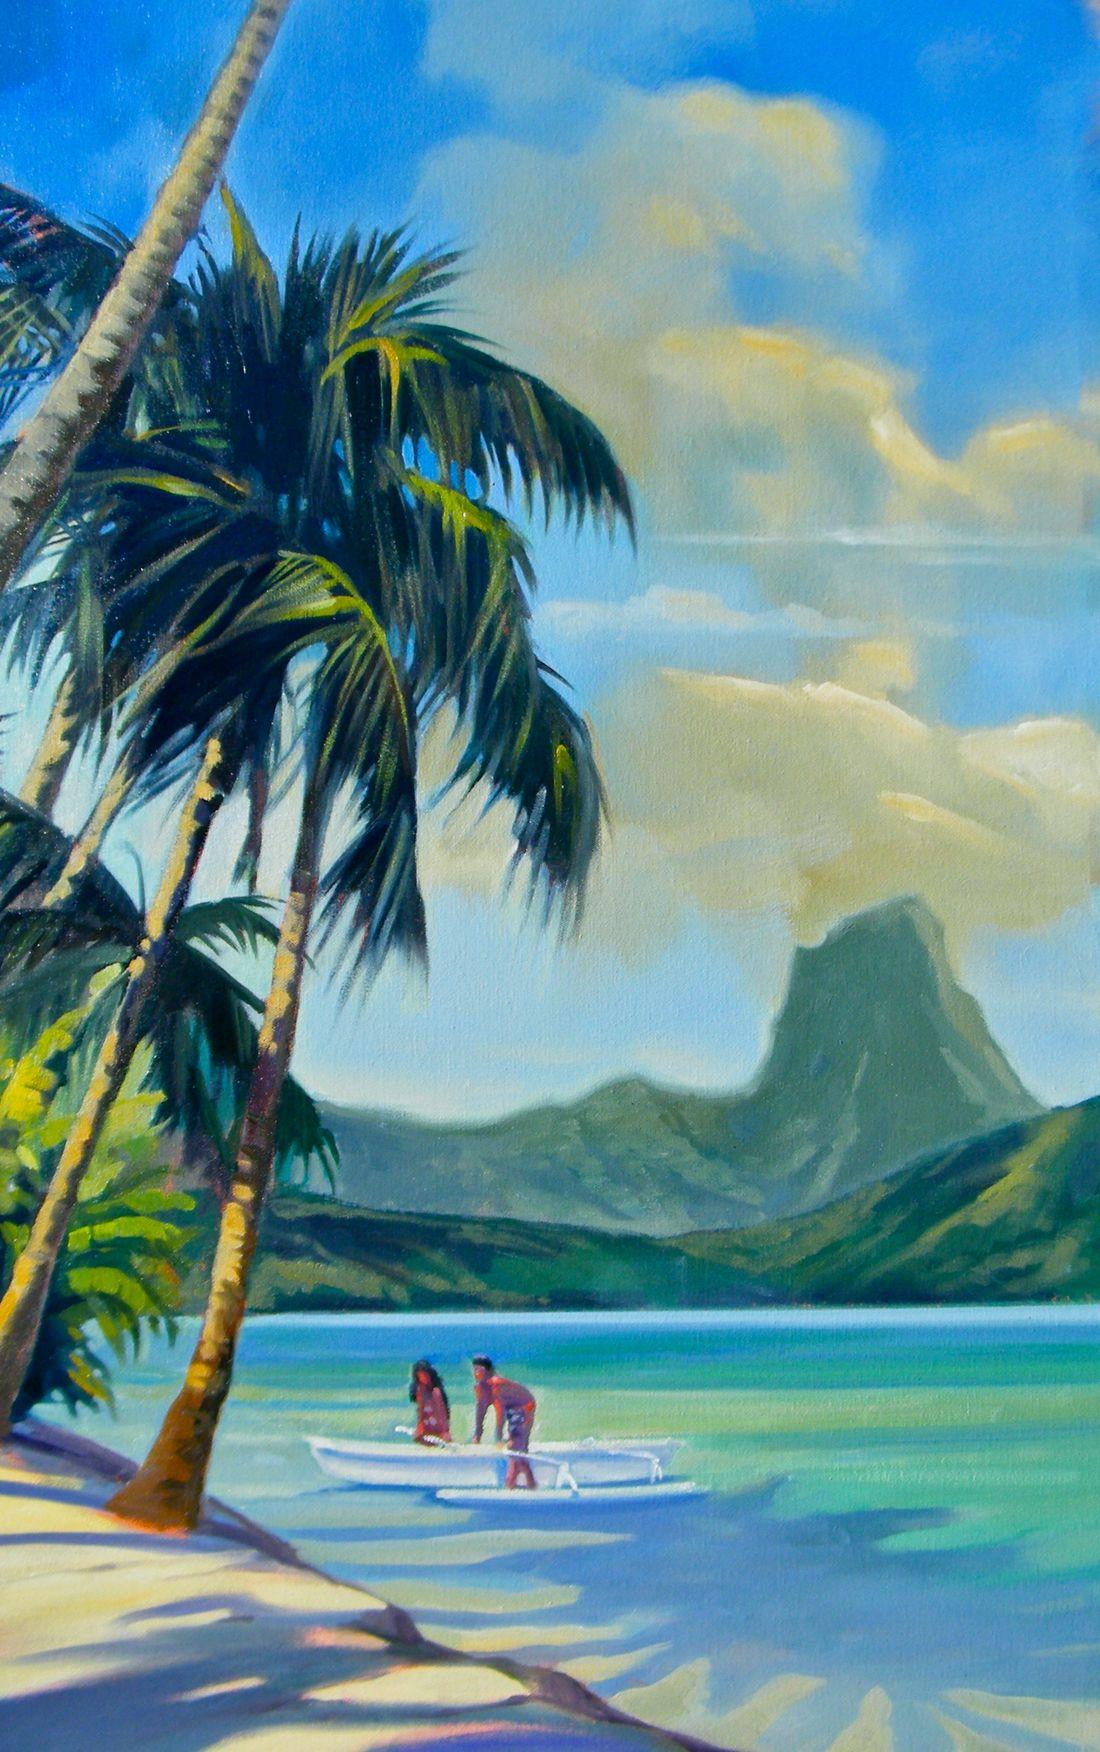 Tahiti Painting By Artist Wade Koniakowsky Bedroomideas Decorideas Livingroomideas Seas Affiches De Voyage Retro Affiches Retro Photo Paysage Magnifique